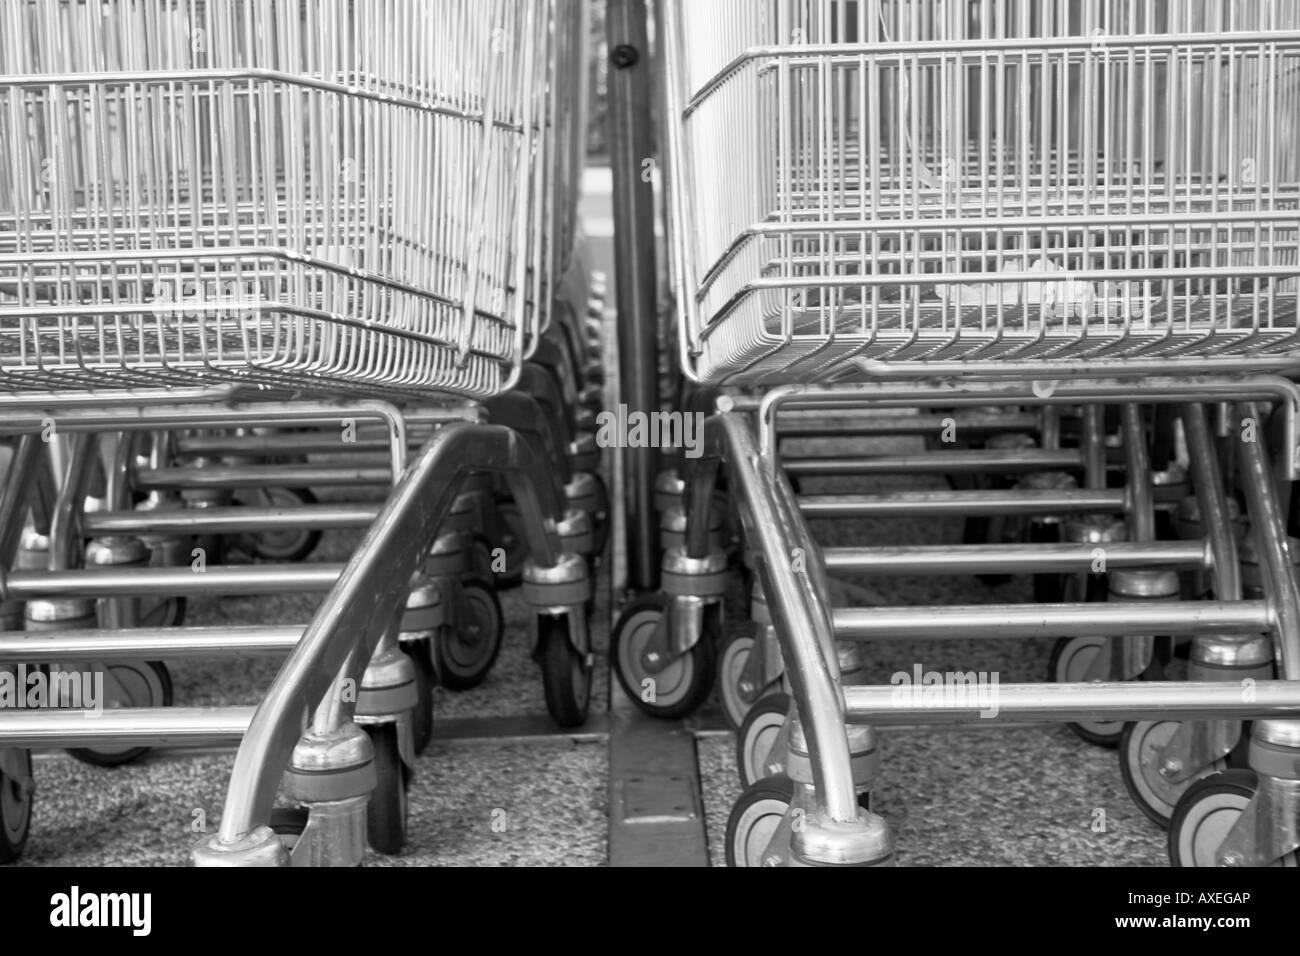 cart,shopping, - Stock Image